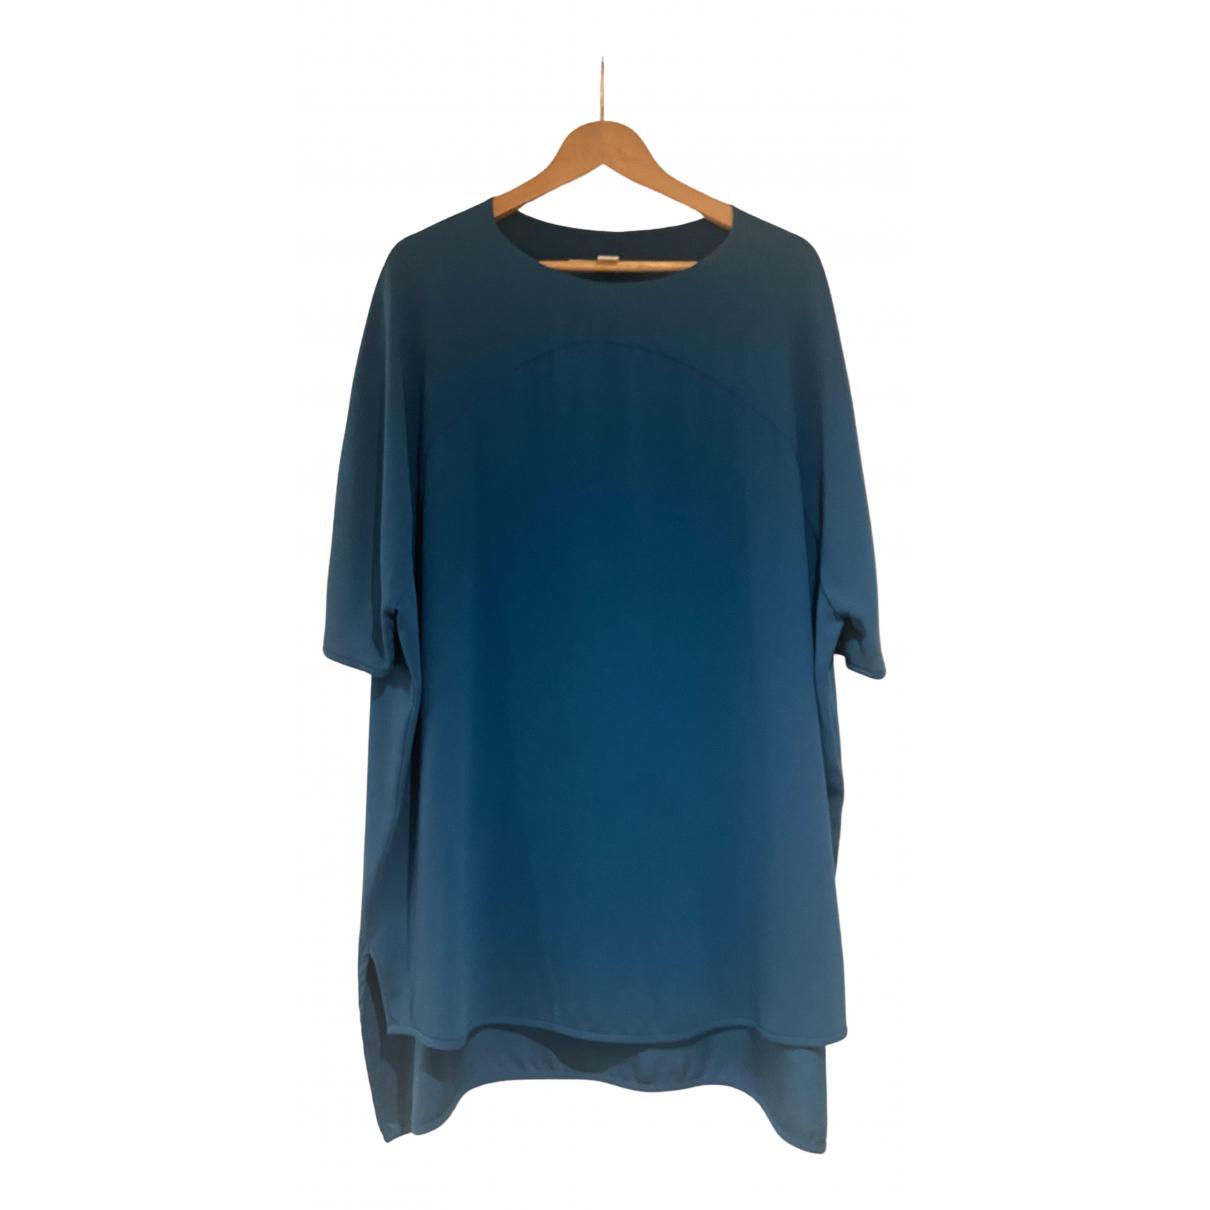 Diane Von Furstenberg - Top   pour femme - turquoise